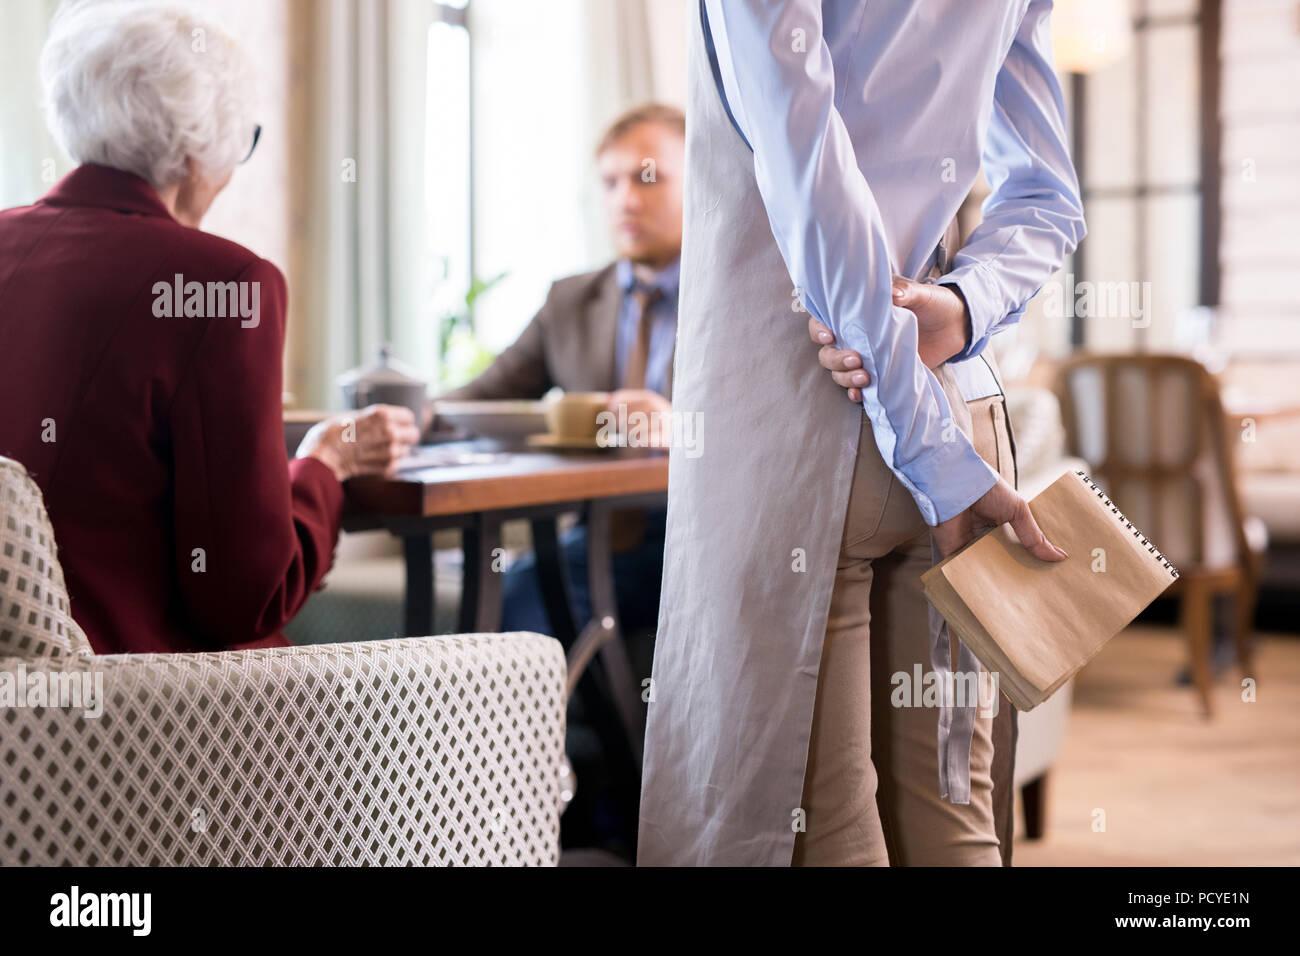 Waiter waiting for order - Stock Image